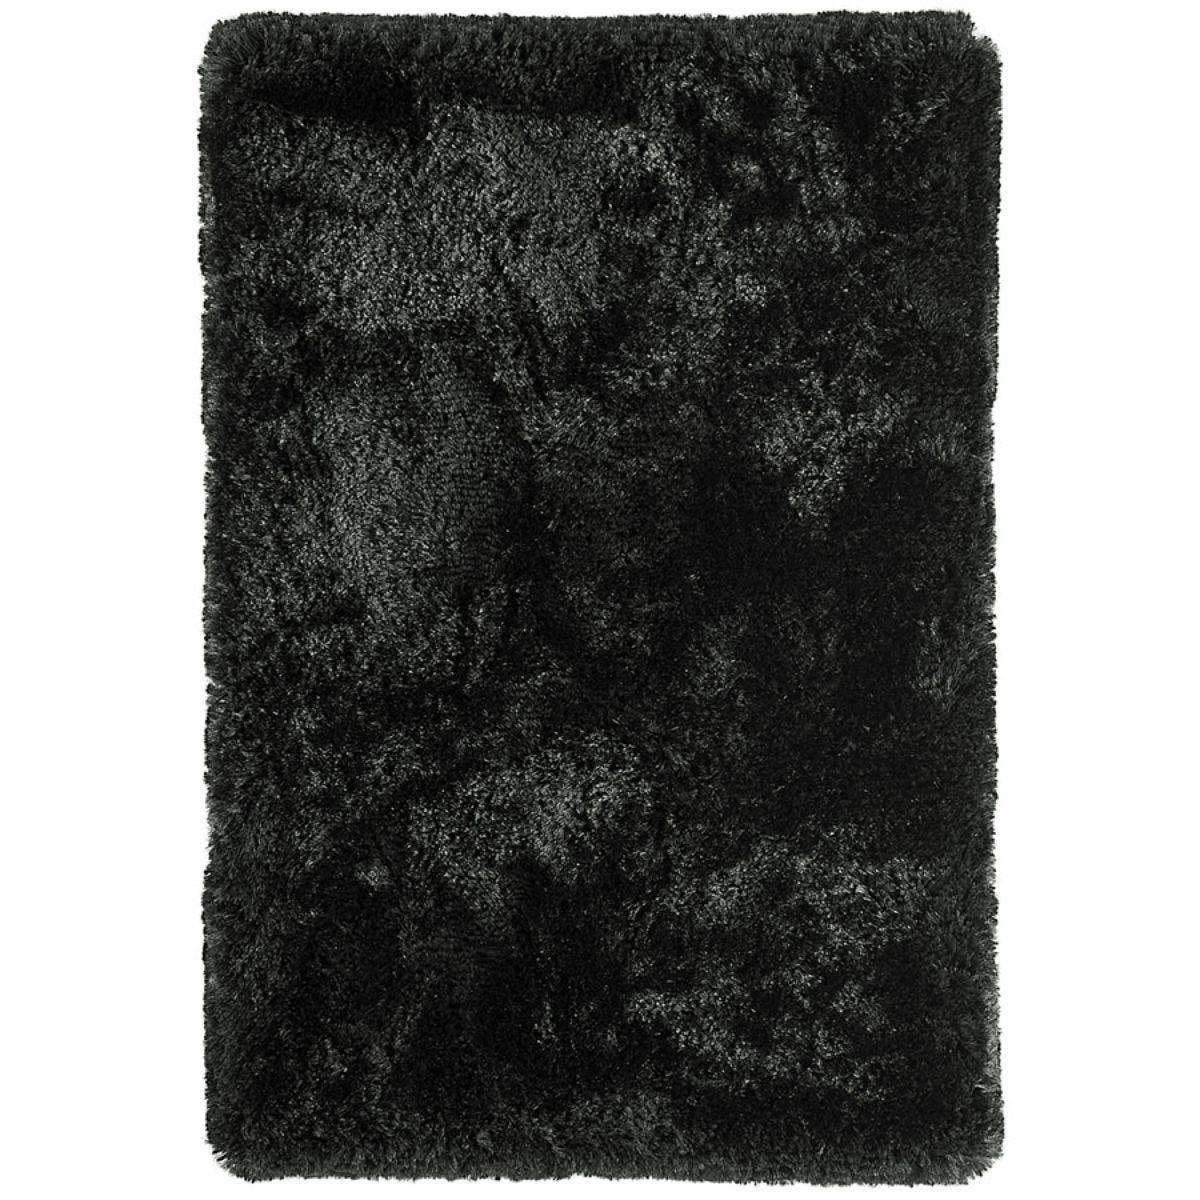 Asiatic Plush Shaggy Rug, 200 x 300cm - Black